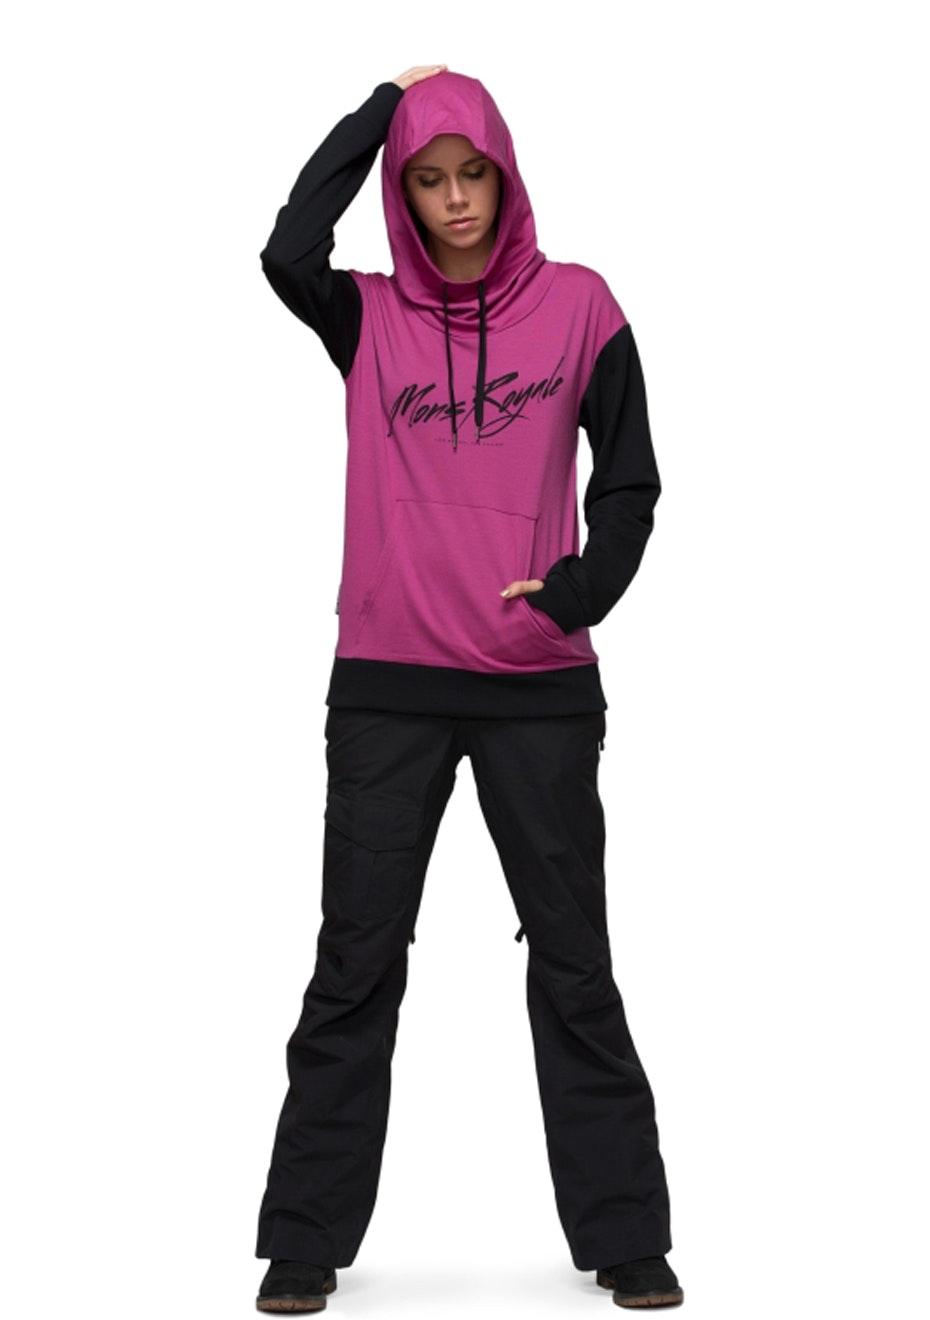 MONS ROYALE - Womens - Pullover Hoody Signature - Fuschia / Black